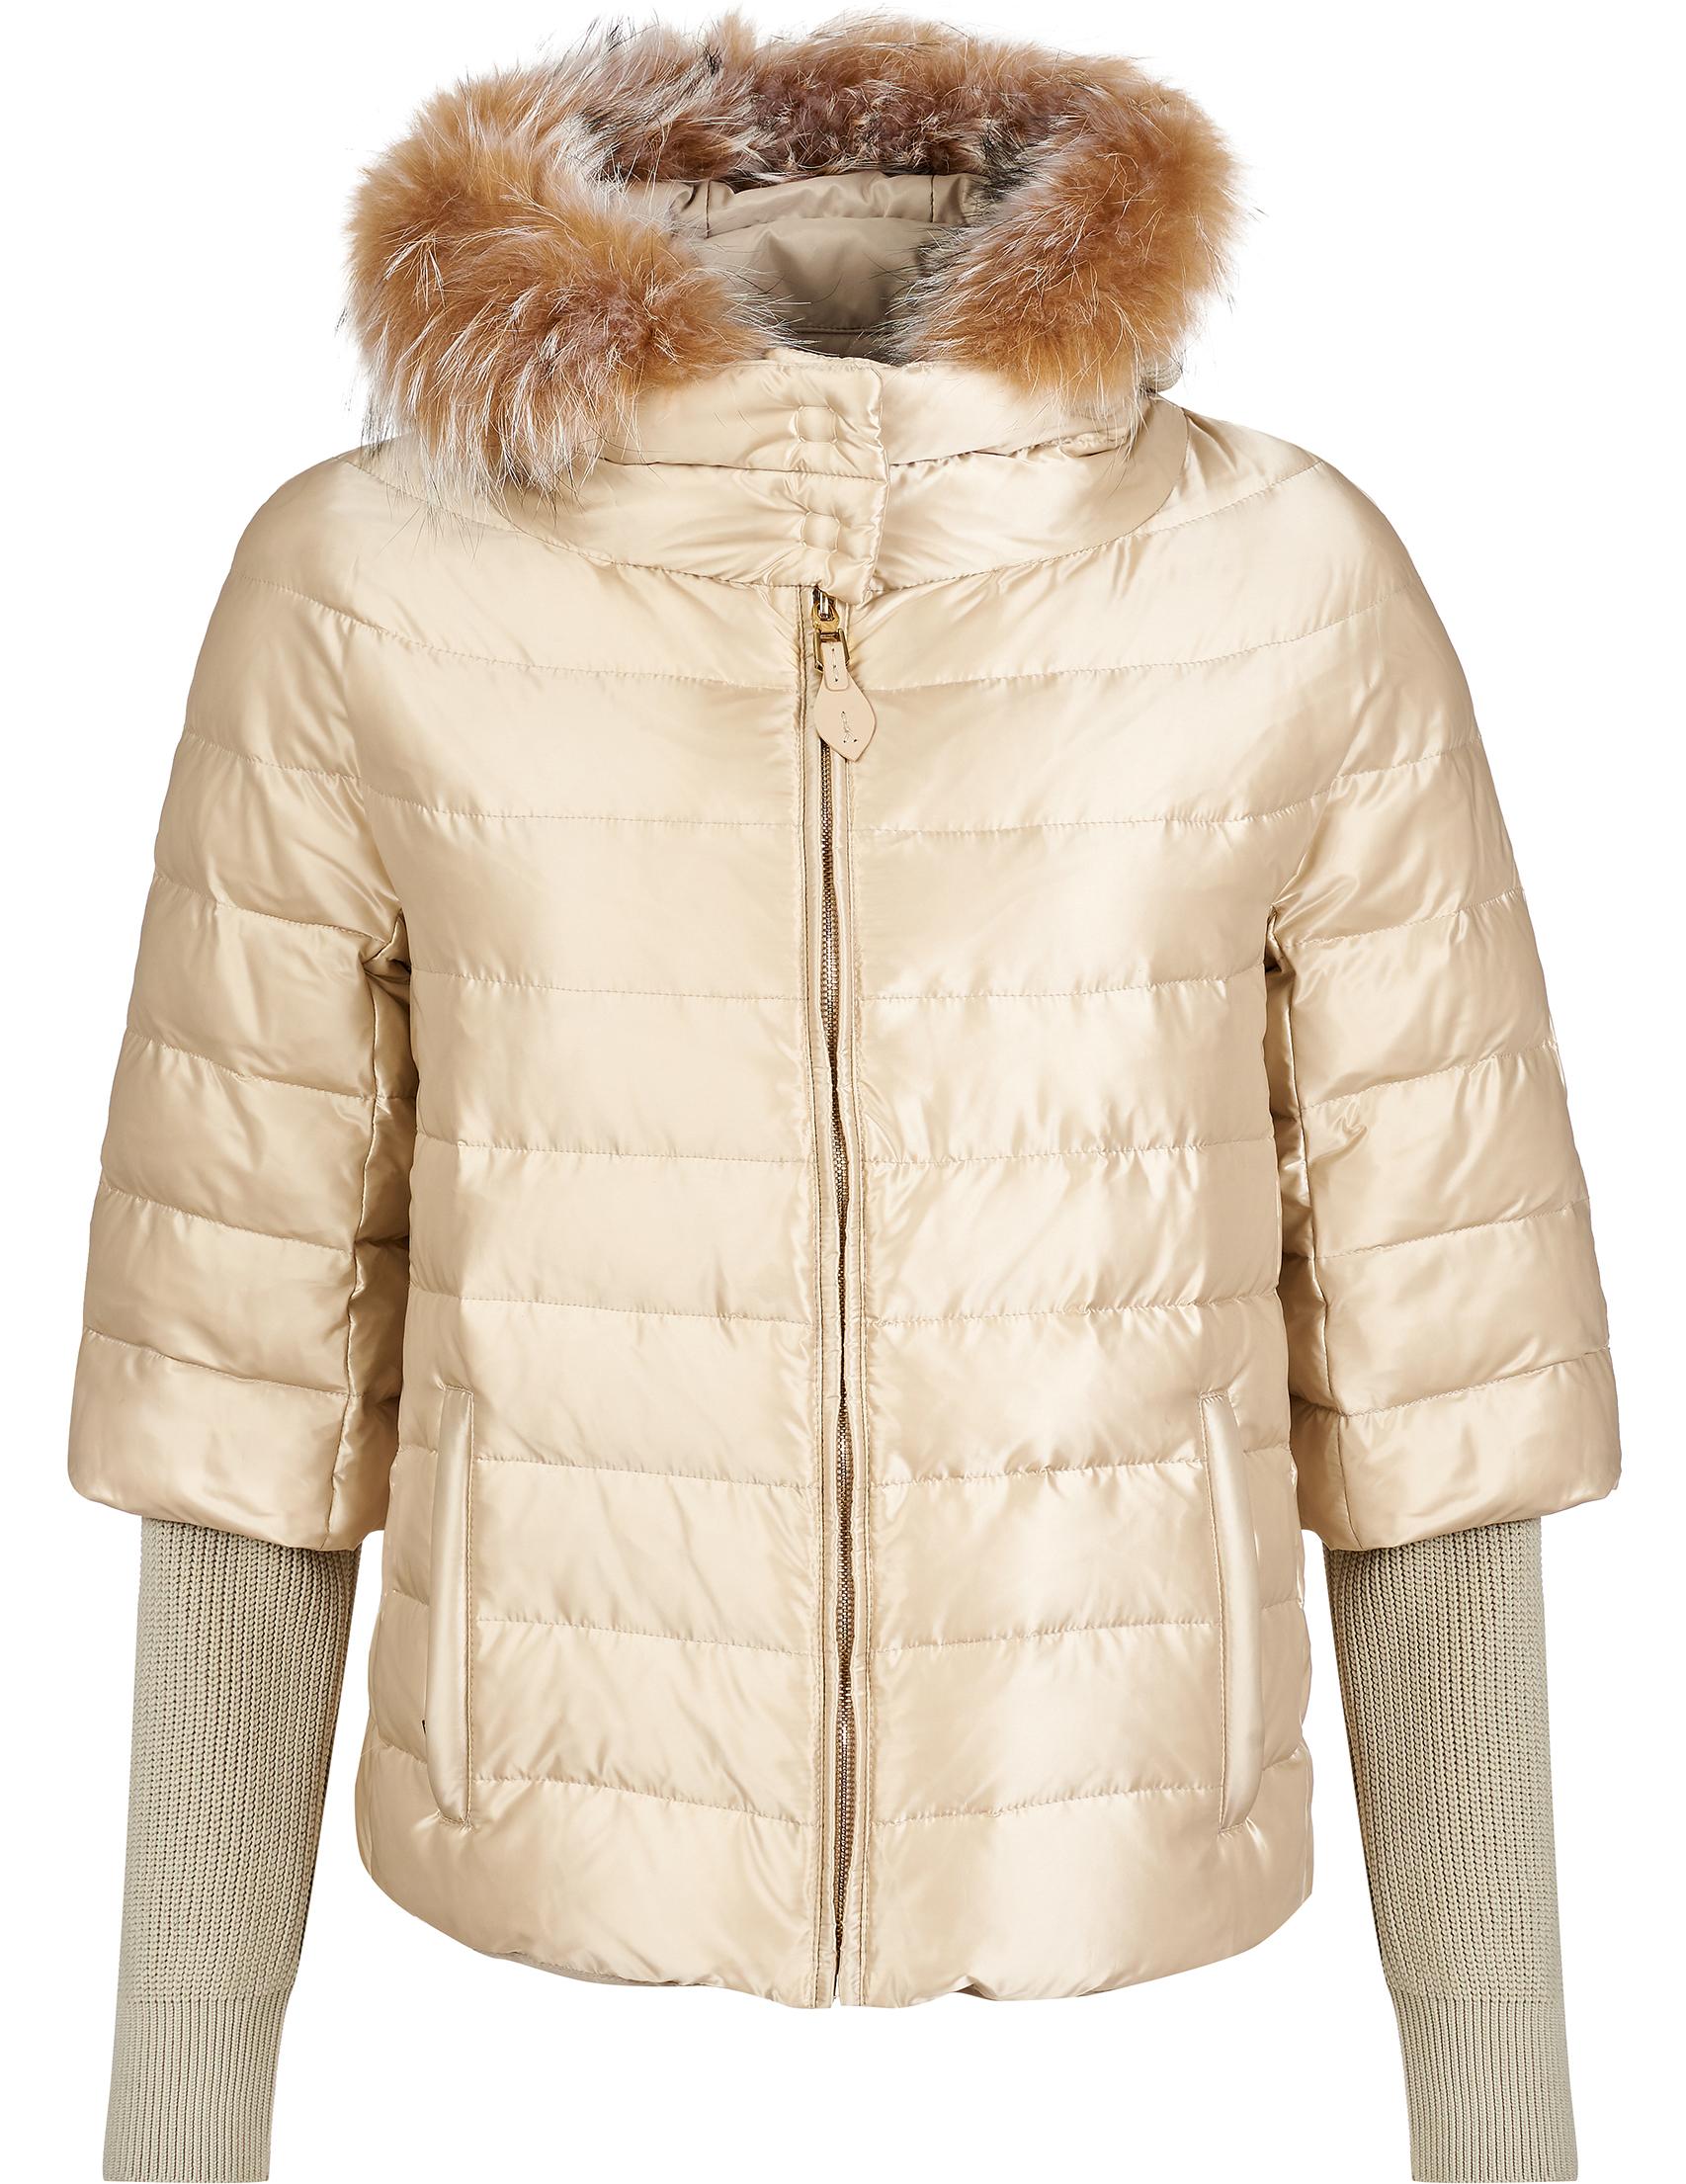 Купить Куртки, Куртка, GALLOTTI, Бежевый, 100%Полиамид;100%Полиэстер;100%Мех, Осень-Зима